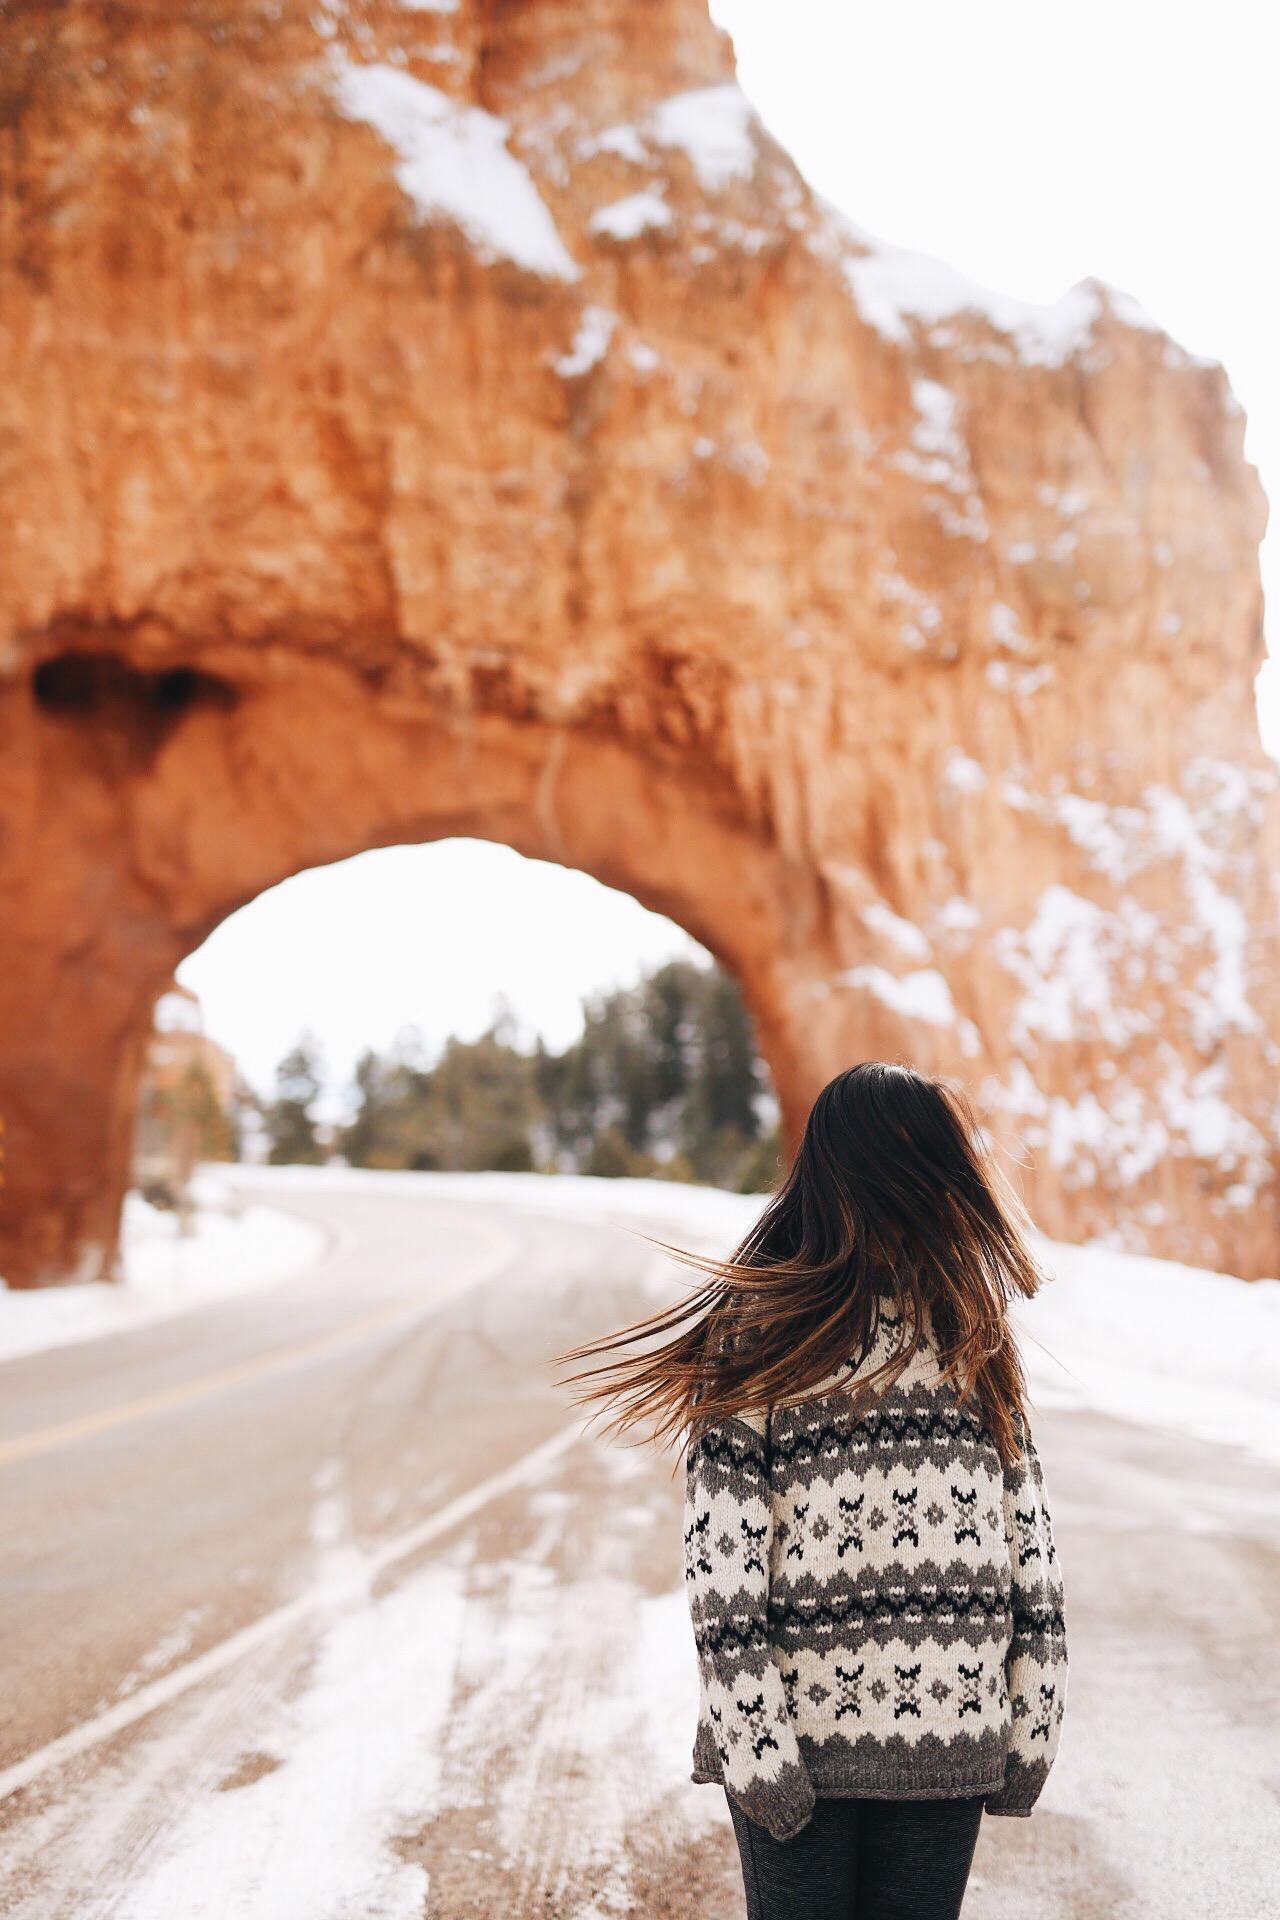 Bryce Canyon National Park During Winter | Archway in Bryce Canyon National Park | Traveling Southern Utah | elanaloo.com